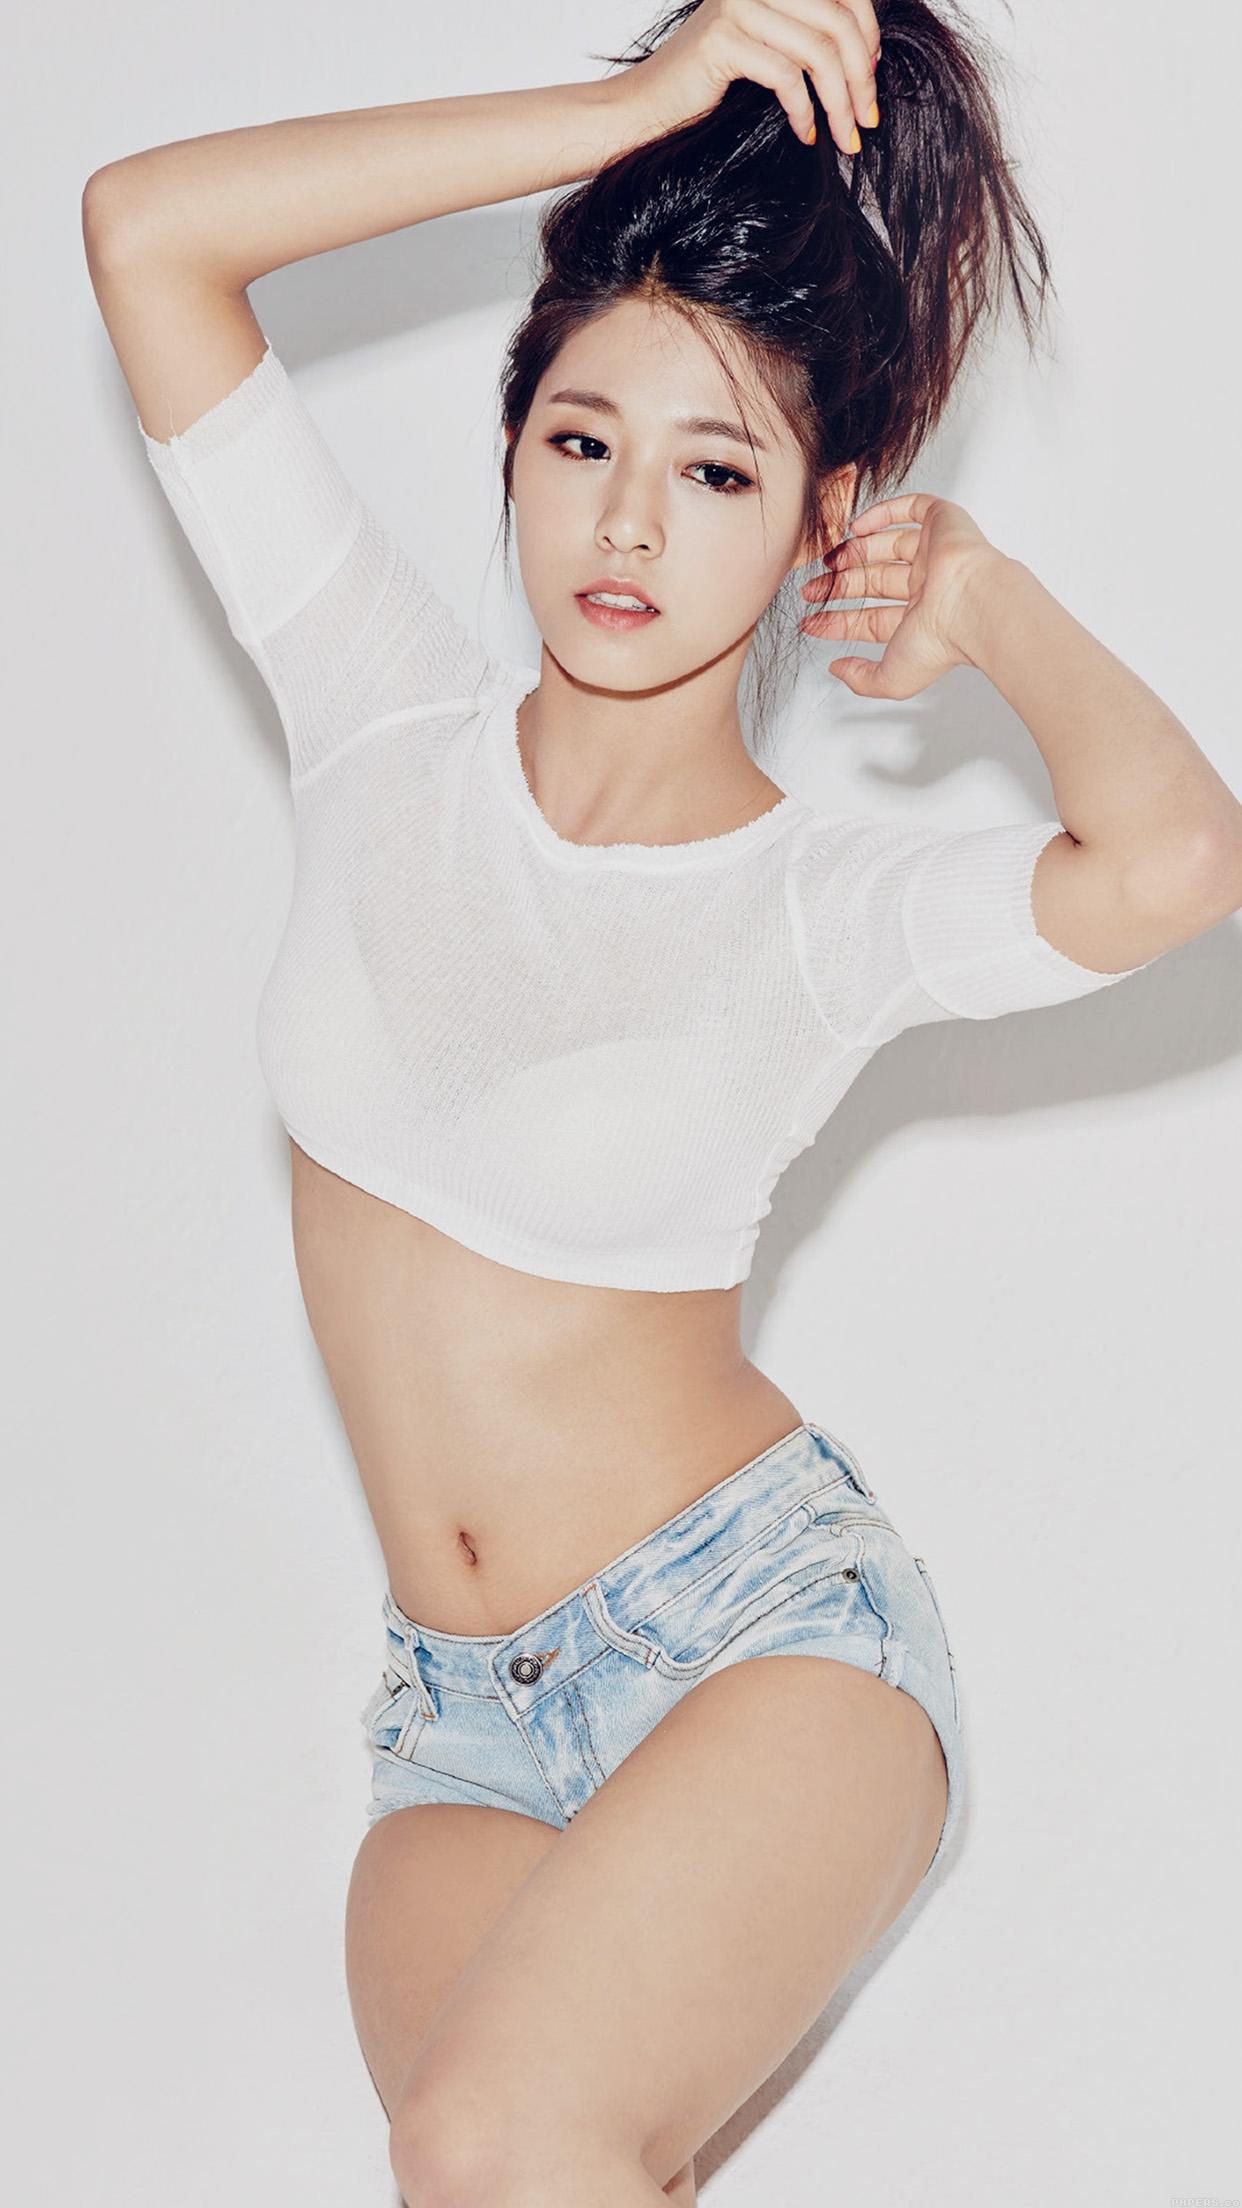 Iphone6papers He38 Seolhyun Kpop Aoa Sexy Girl Music